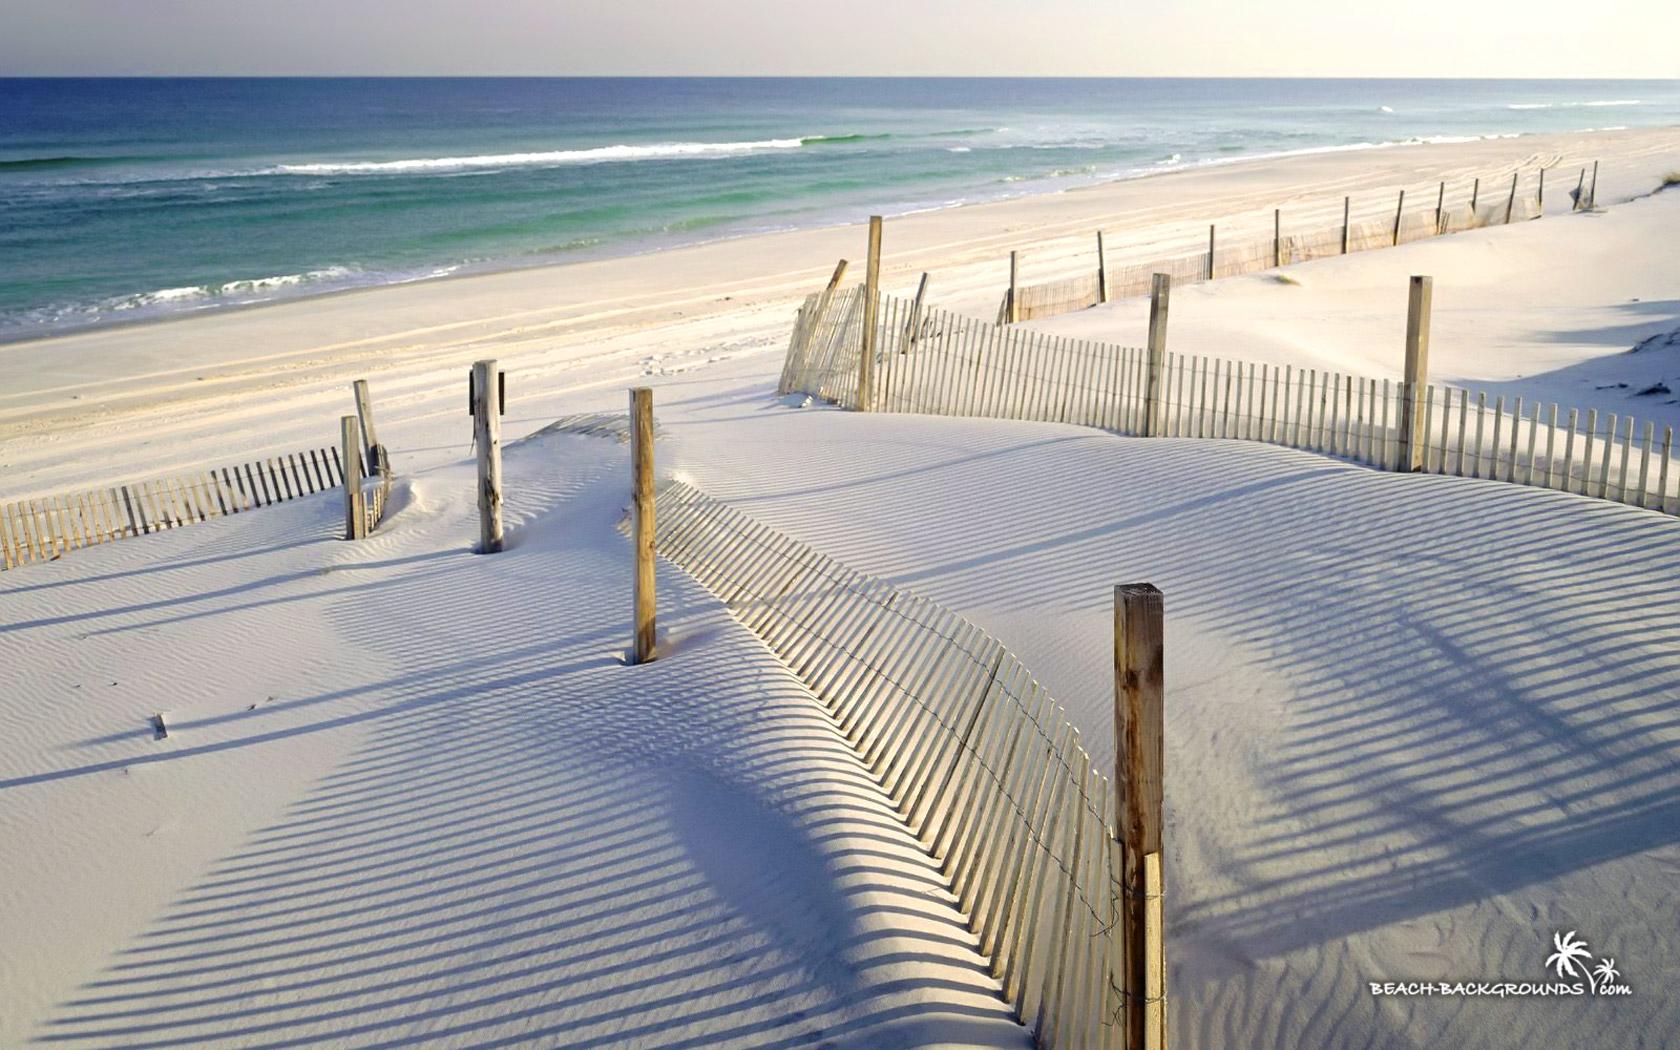 Sandy Beach Wallpaper: Image - White-sandy-beach-wallpaper-1680x1050.jpg